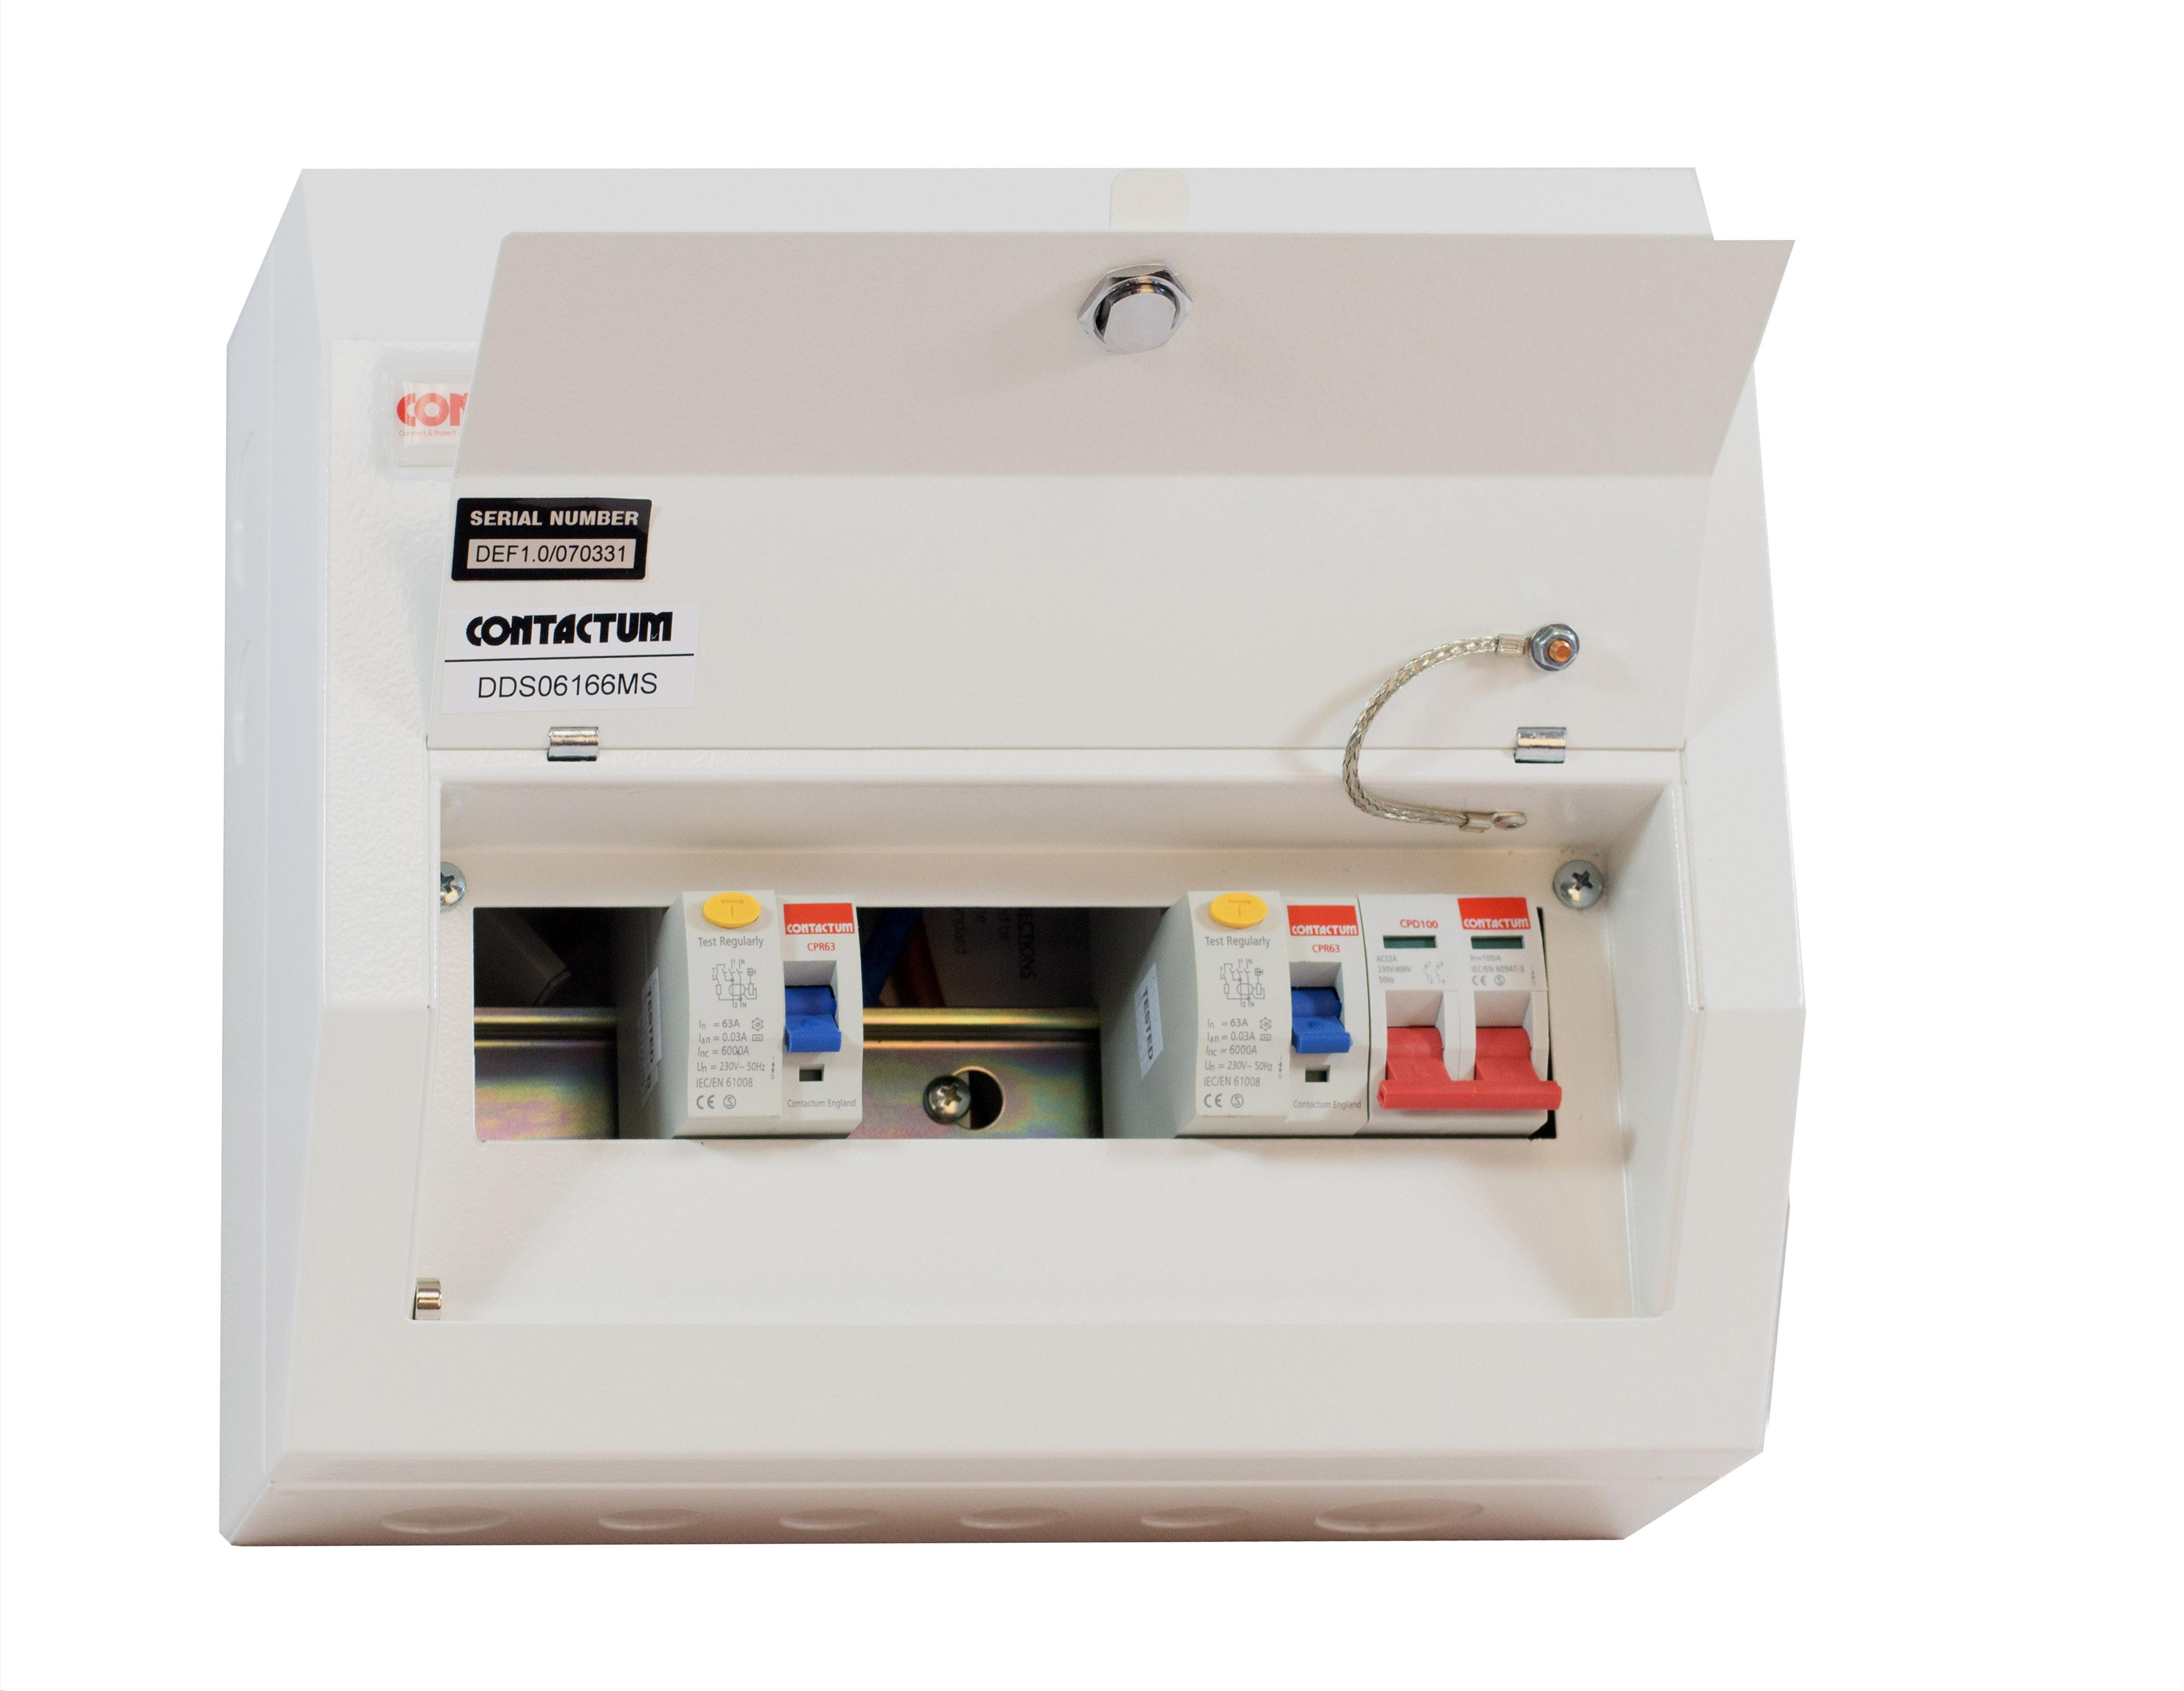 Consumer Units Defender Contactum Wiring Dual Rcd Unit Dds06166ms